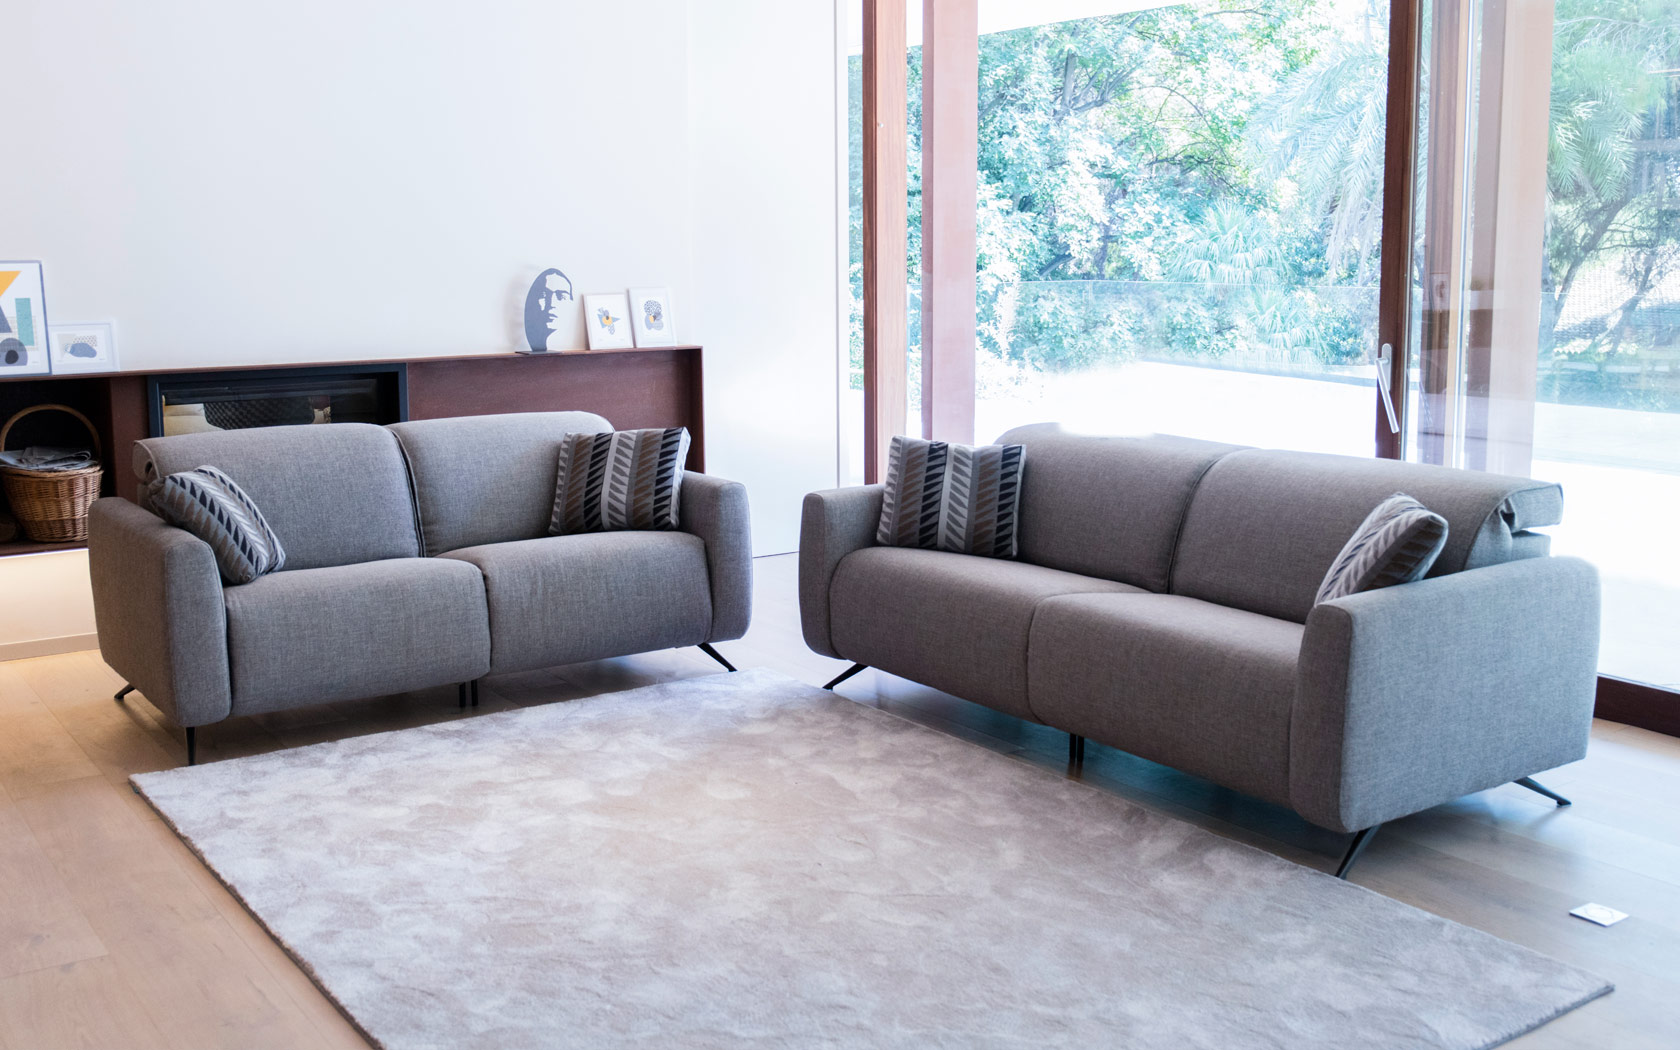 Baltia sofa relax 2020 02